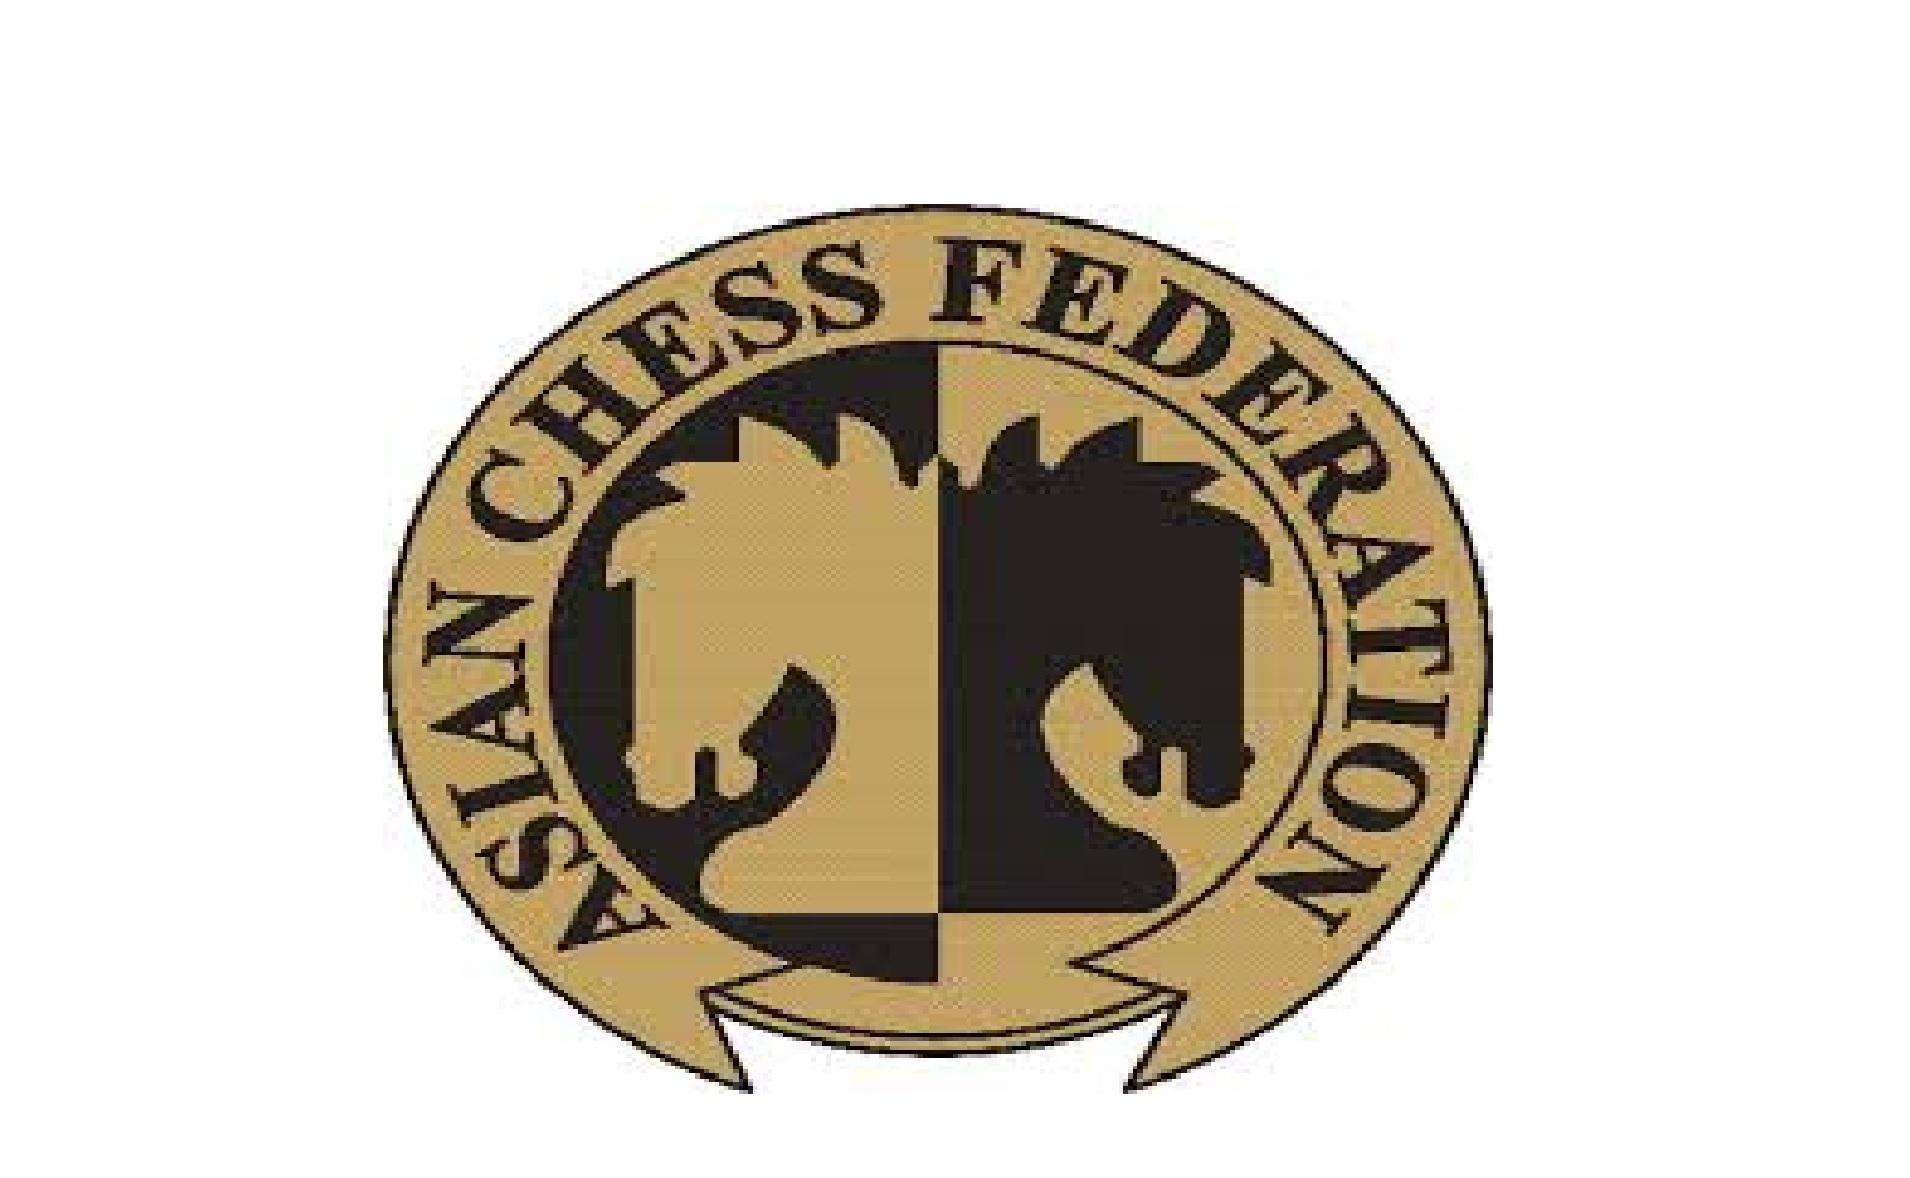 asian chess federation